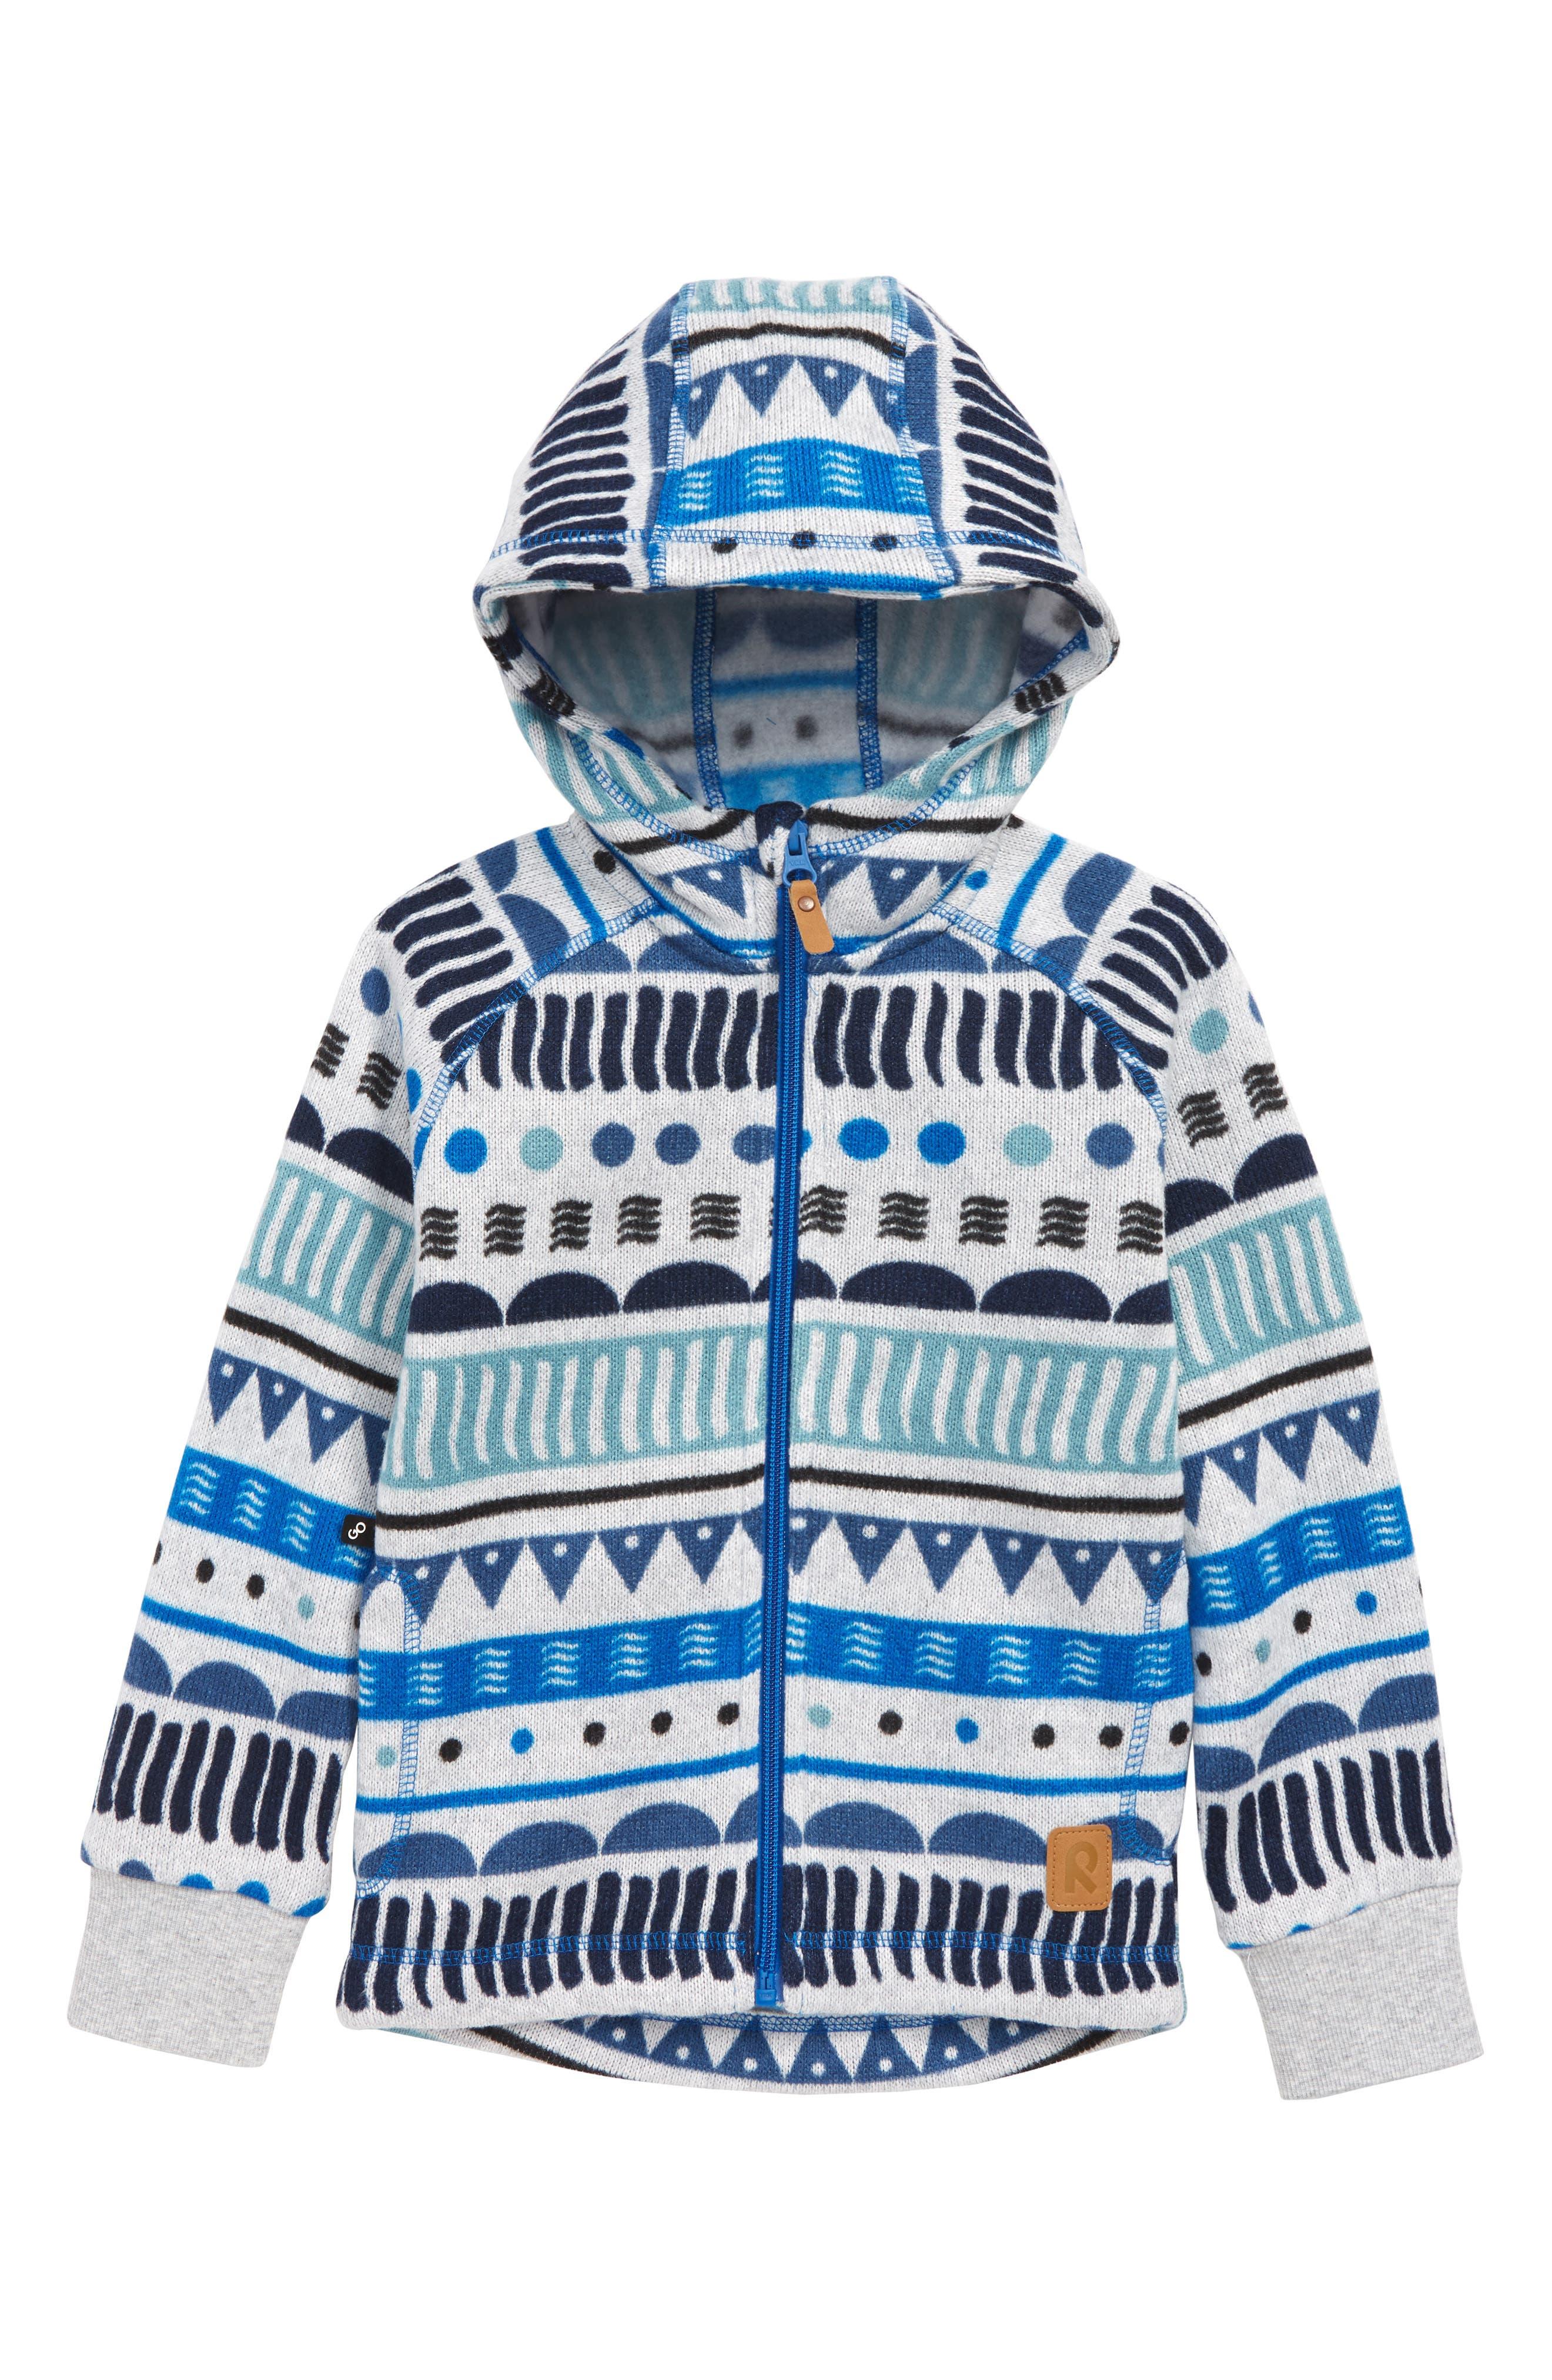 Boys Reima Northern Knit Fleece Hooded Sweatshirt Size 6Y  116 cm  Blue